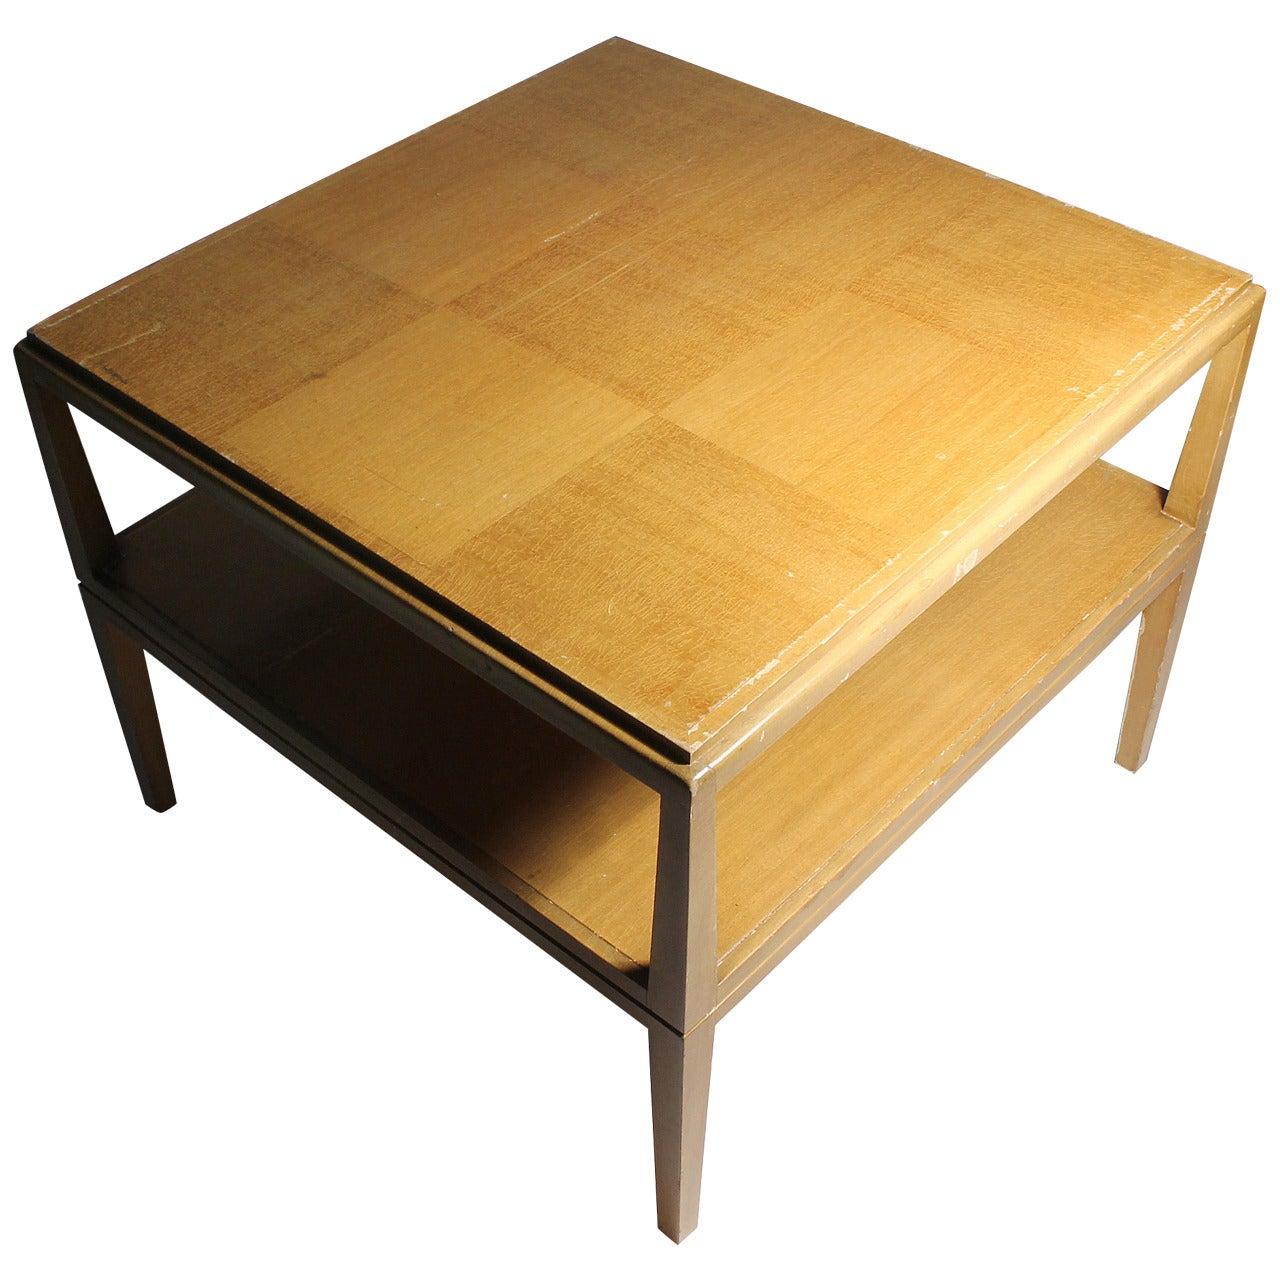 Vintage Tommi Parzinger Patchwork Occasional Table for Charak Modern